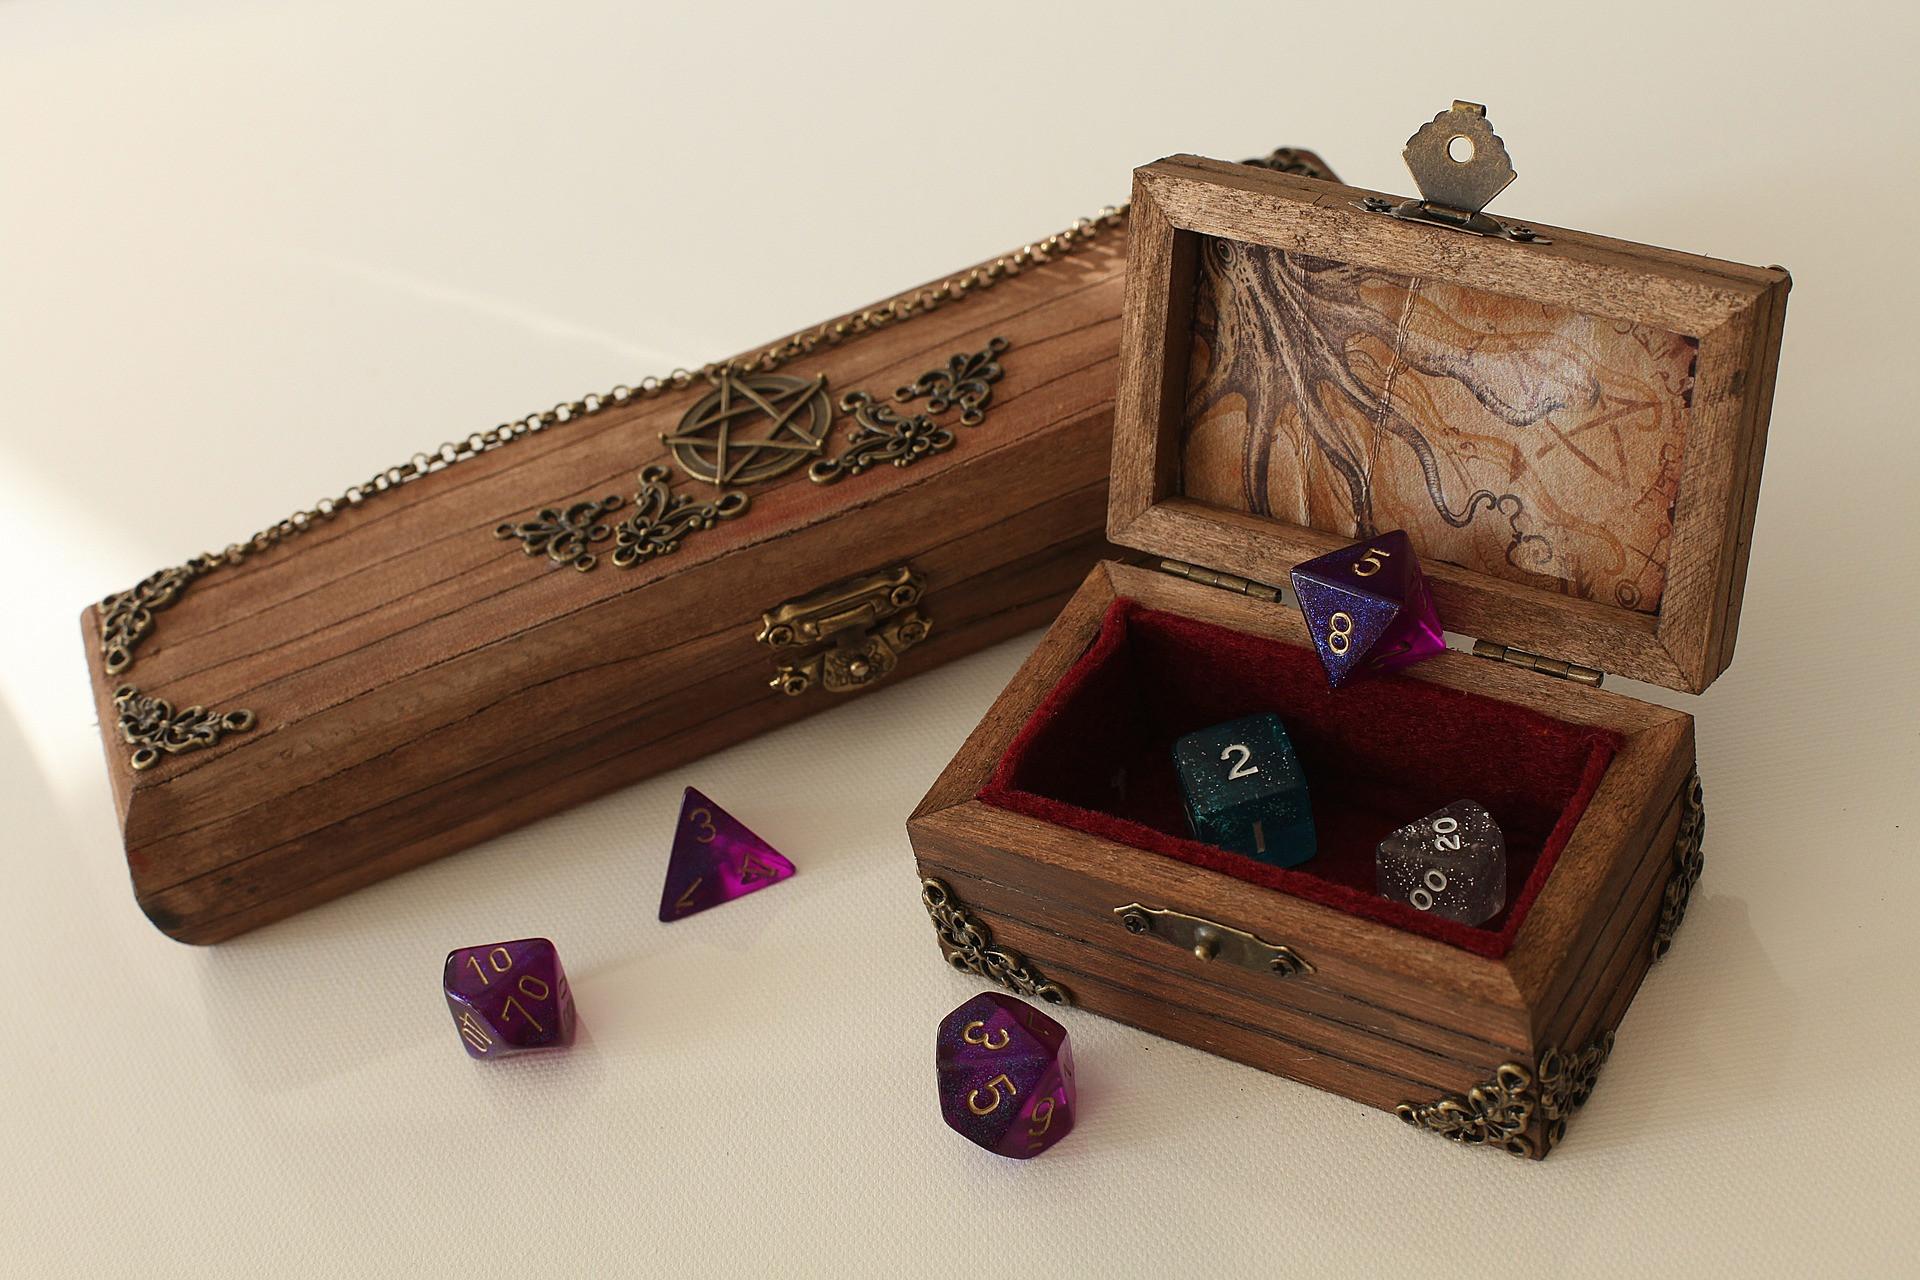 RPG Table #1 (12pm - 4pm) - DM/Lead